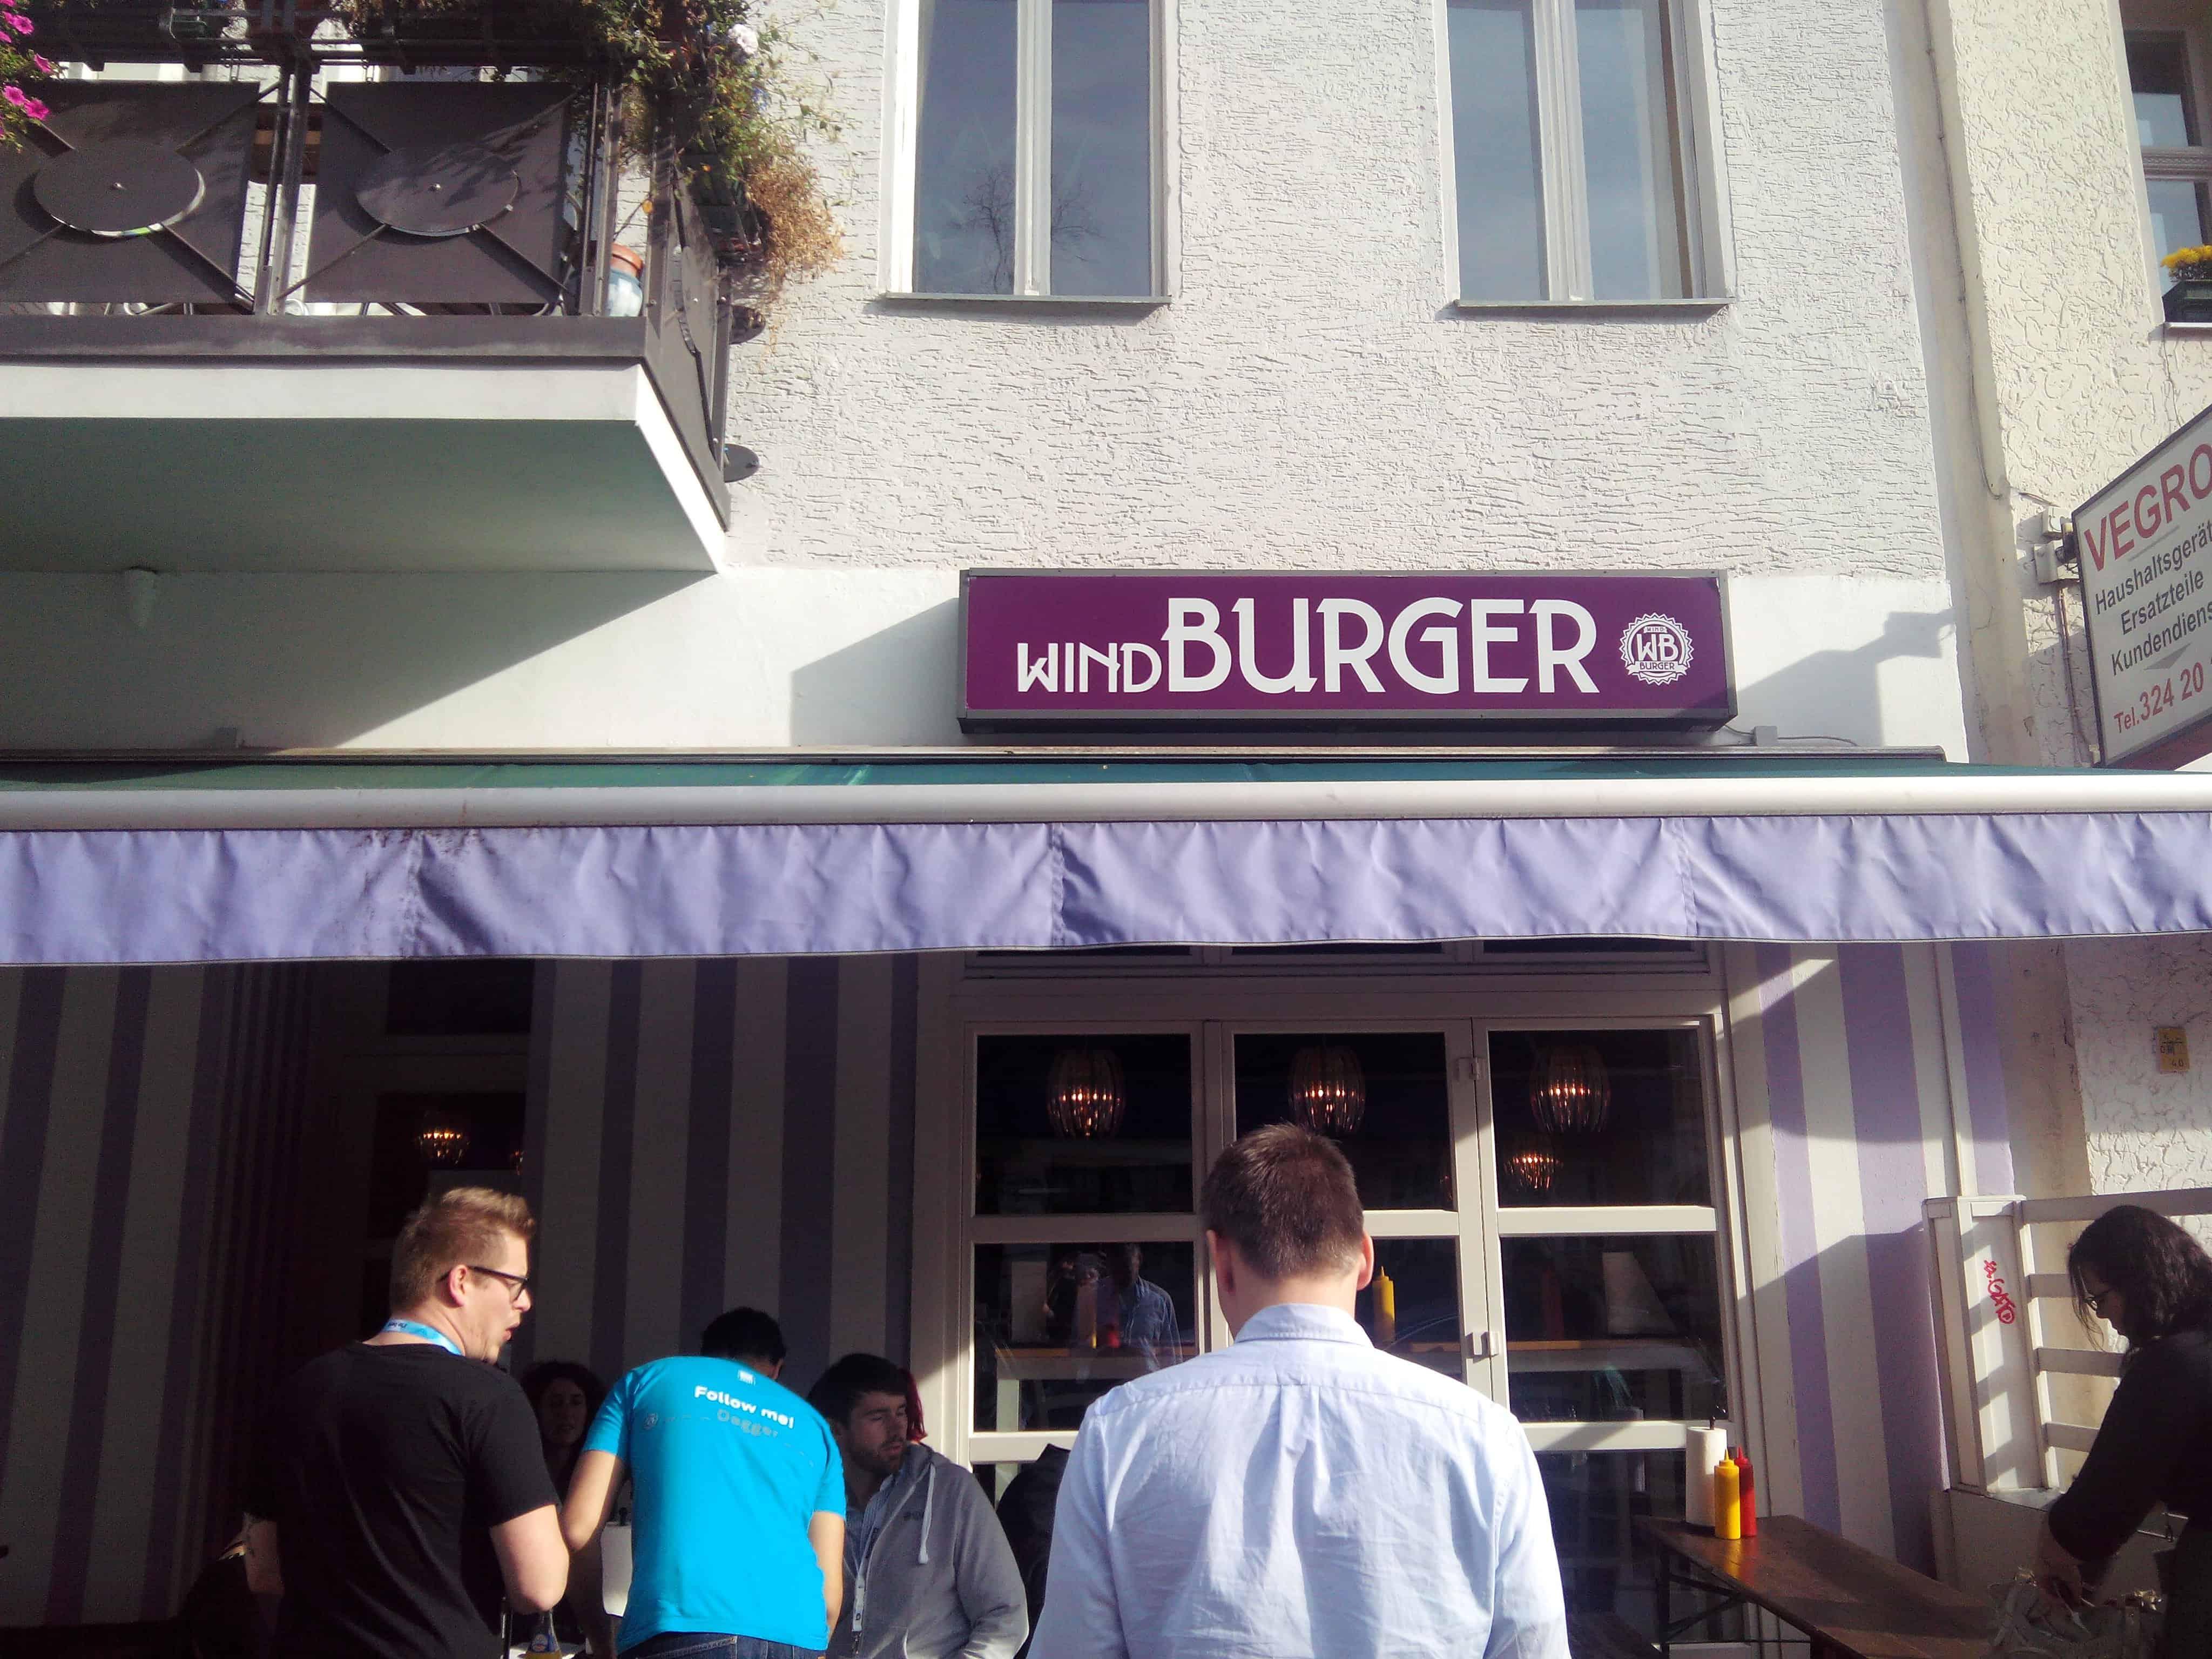 getestet burger in berlin das windburger hubert testethubert testet. Black Bedroom Furniture Sets. Home Design Ideas